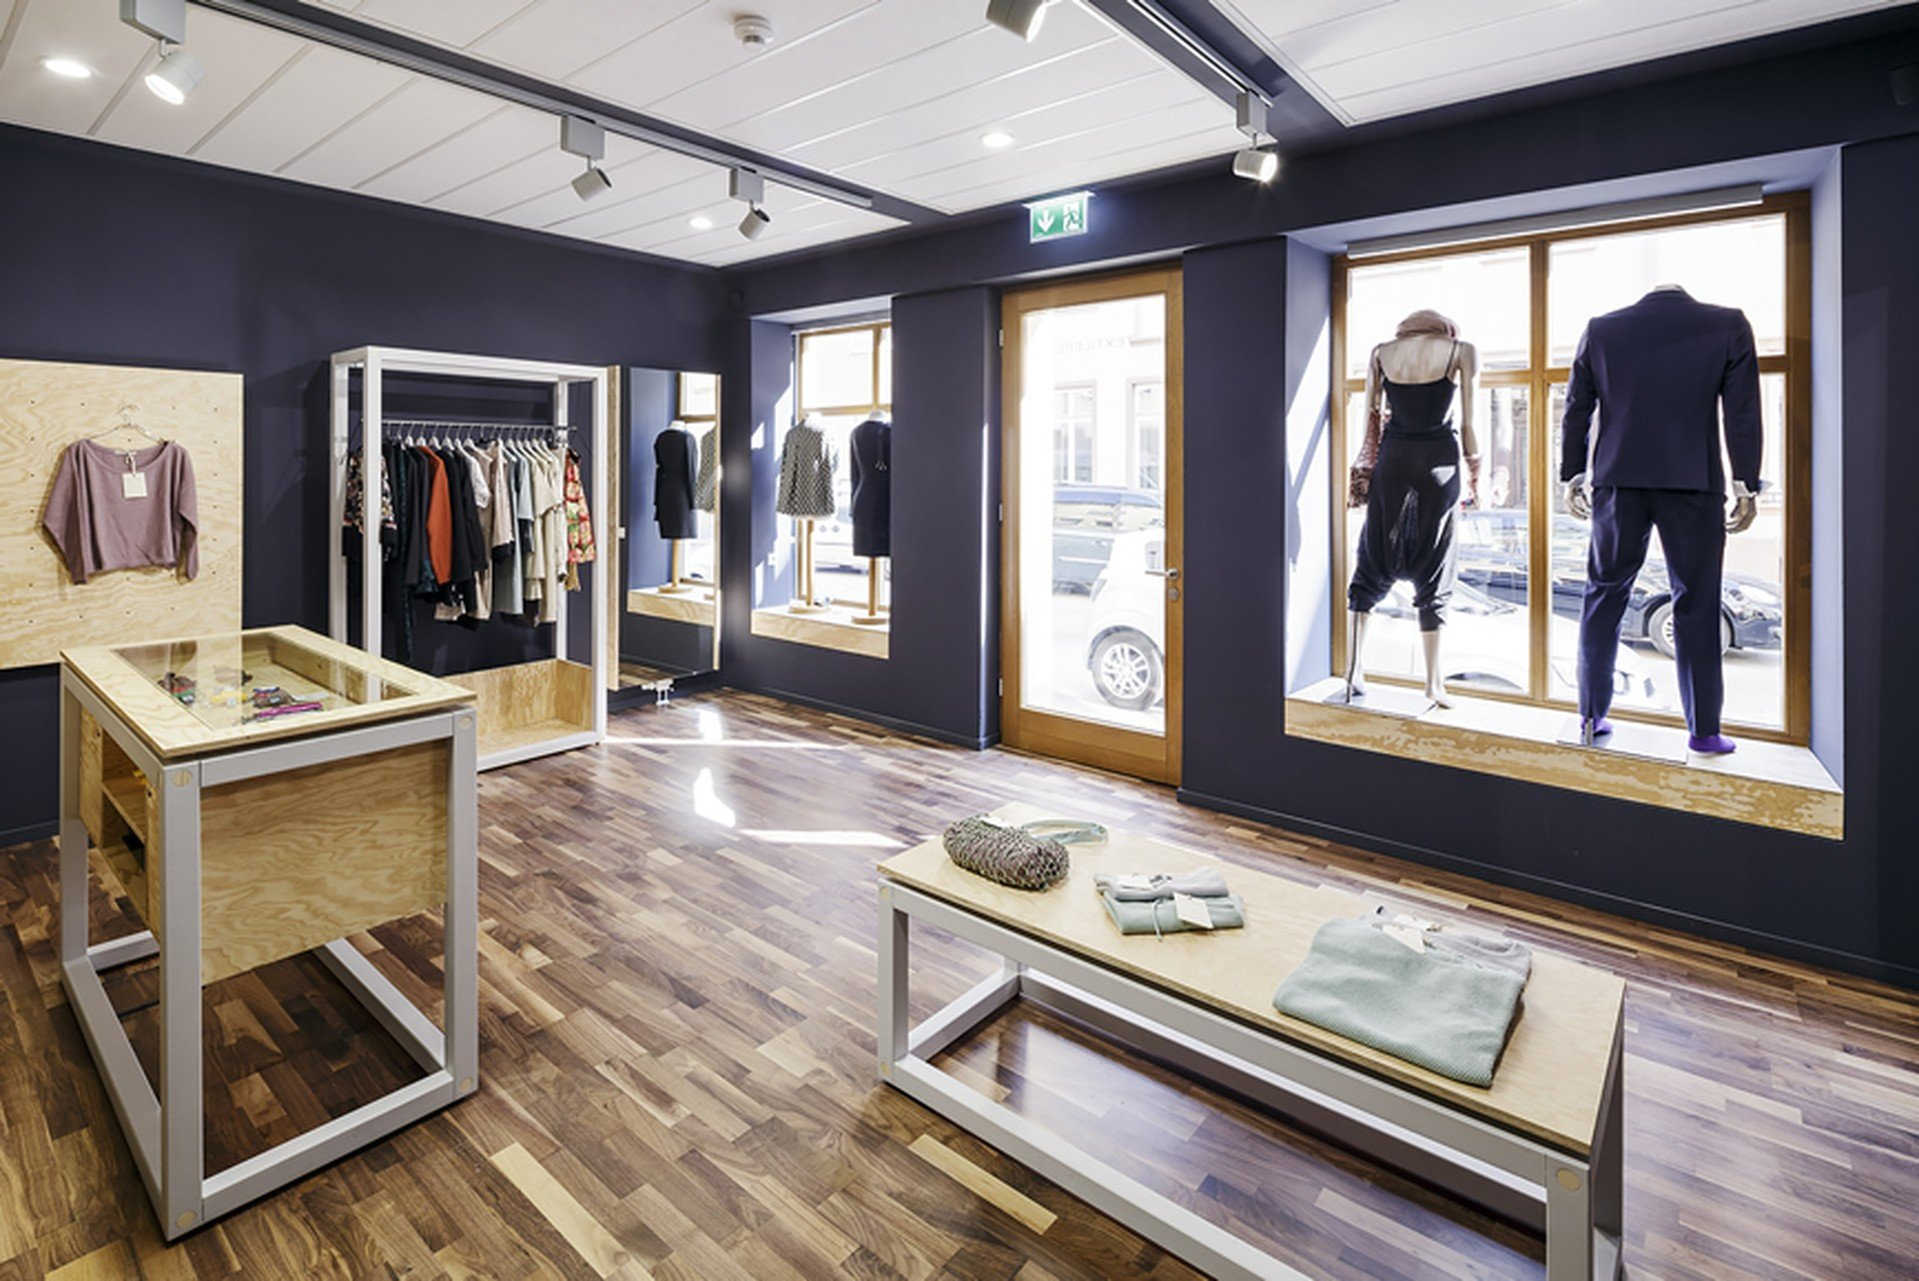 Mannheim workshop spaces Galerie Textilerei Showroom image 2